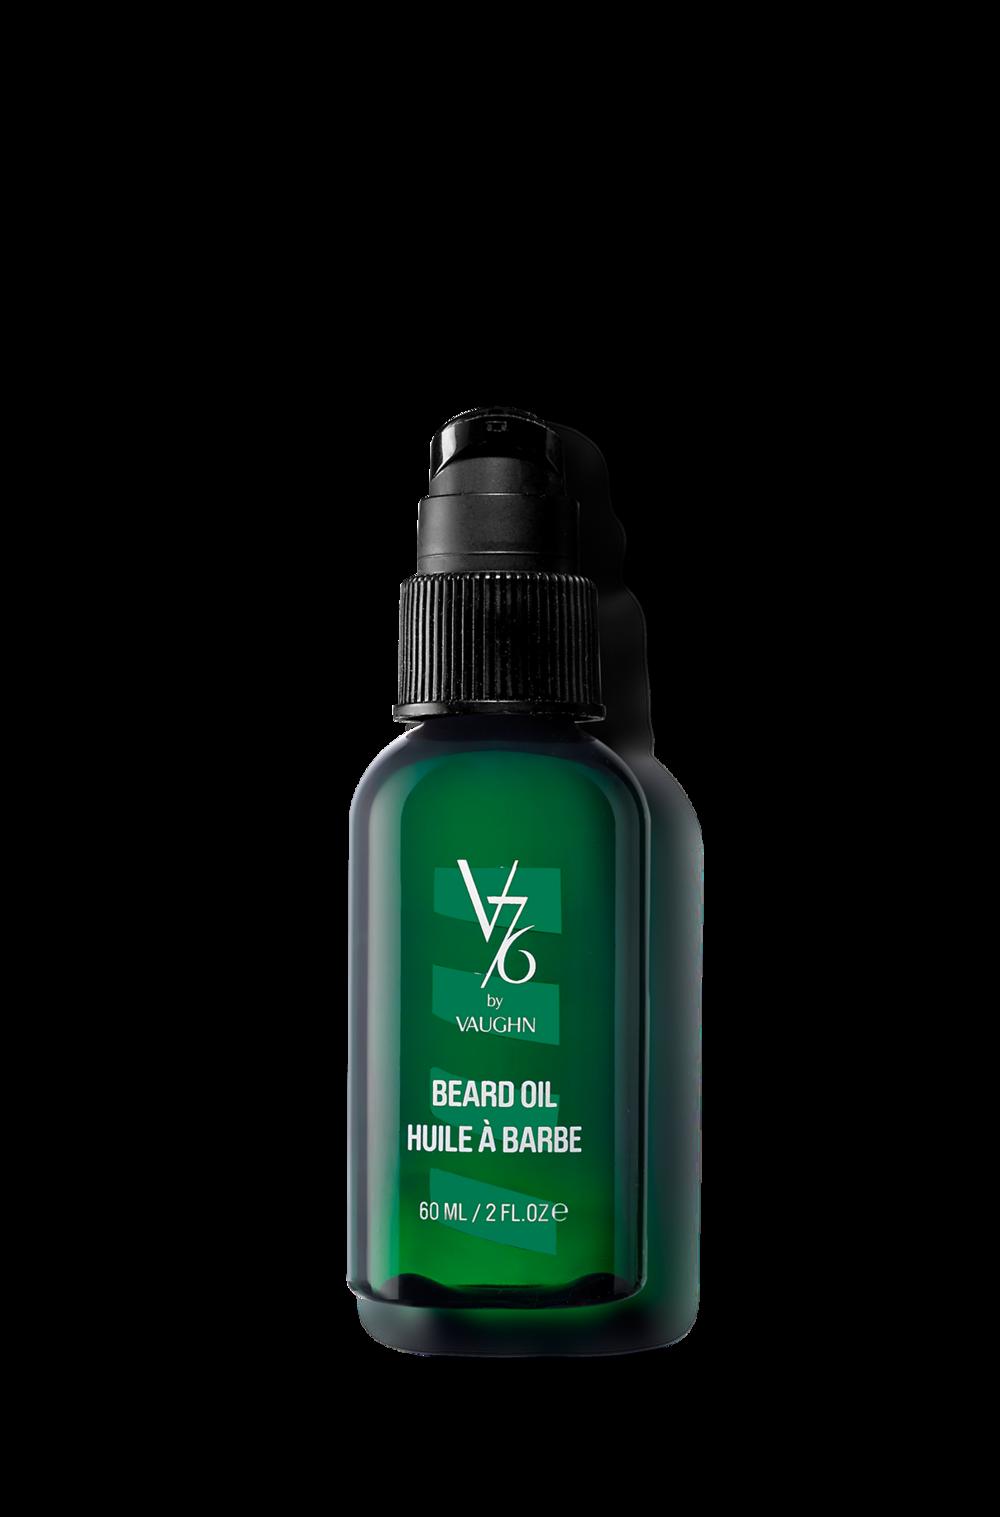 V76 by Vaugn  Beard Oil, 2 0z. $19.00